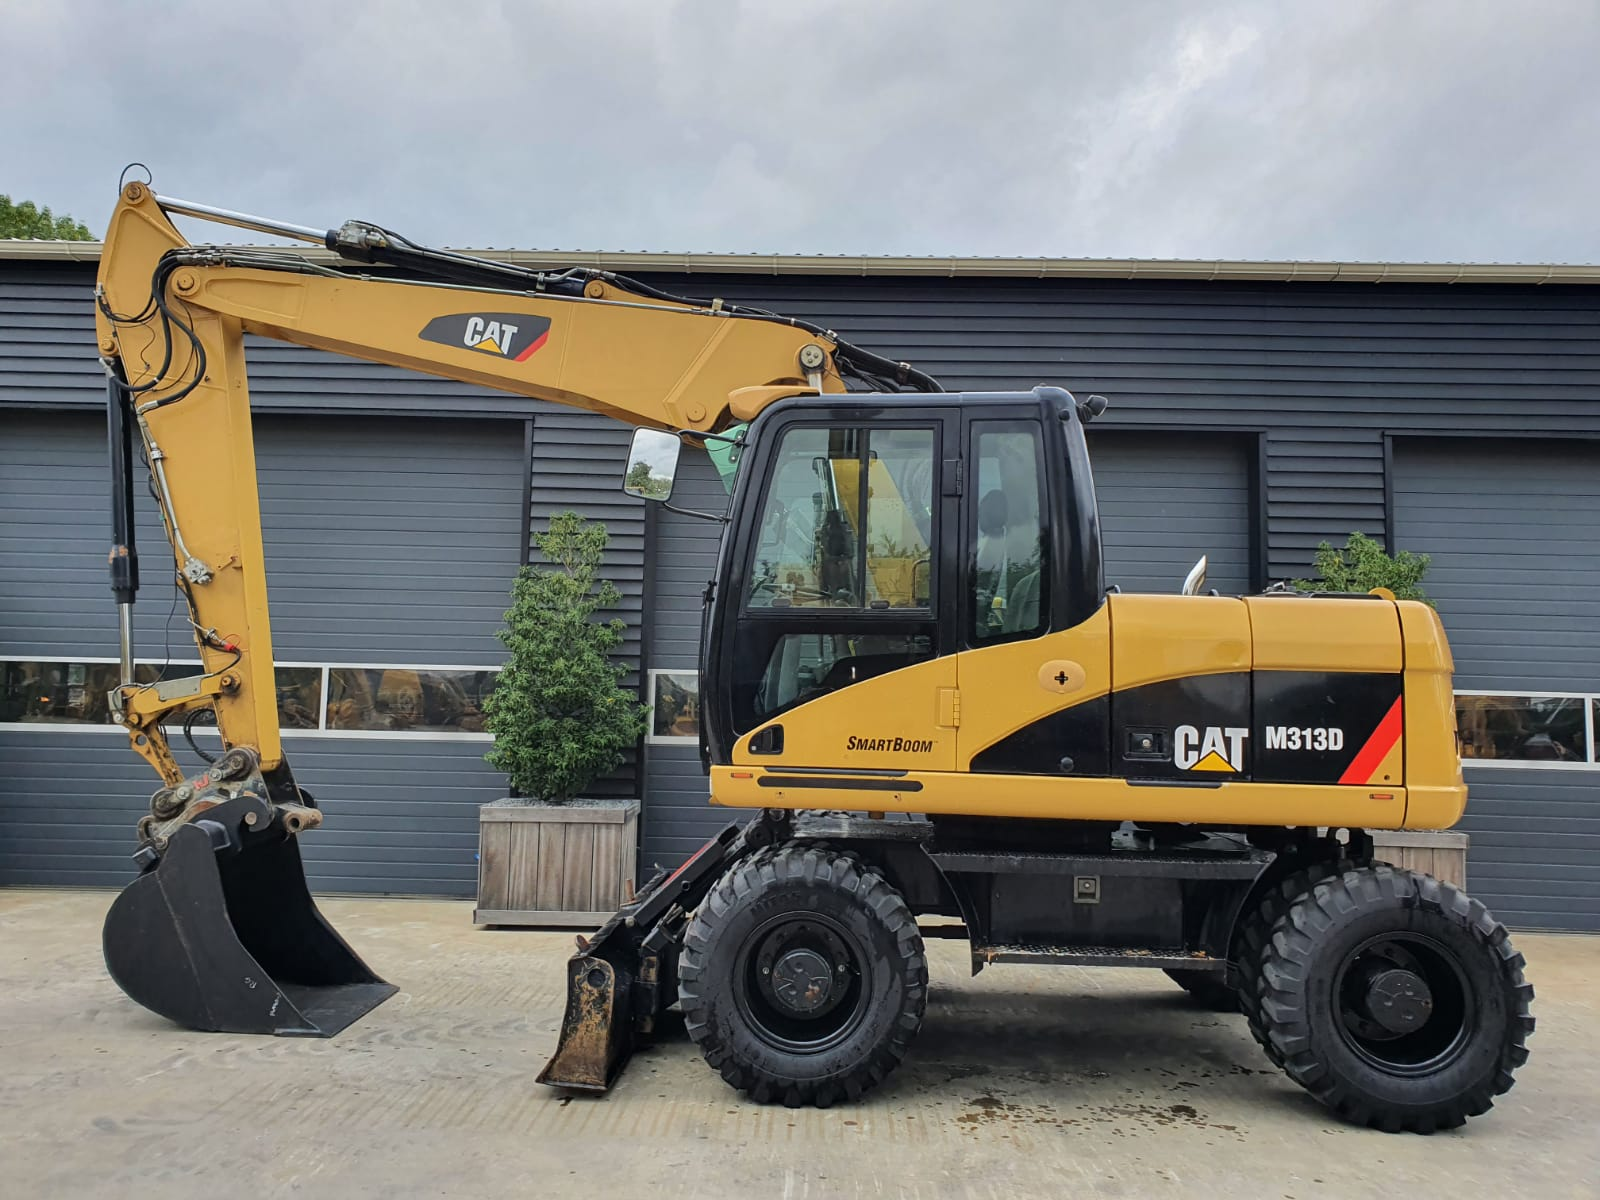 Caterpillar M313D Wheeled excavator